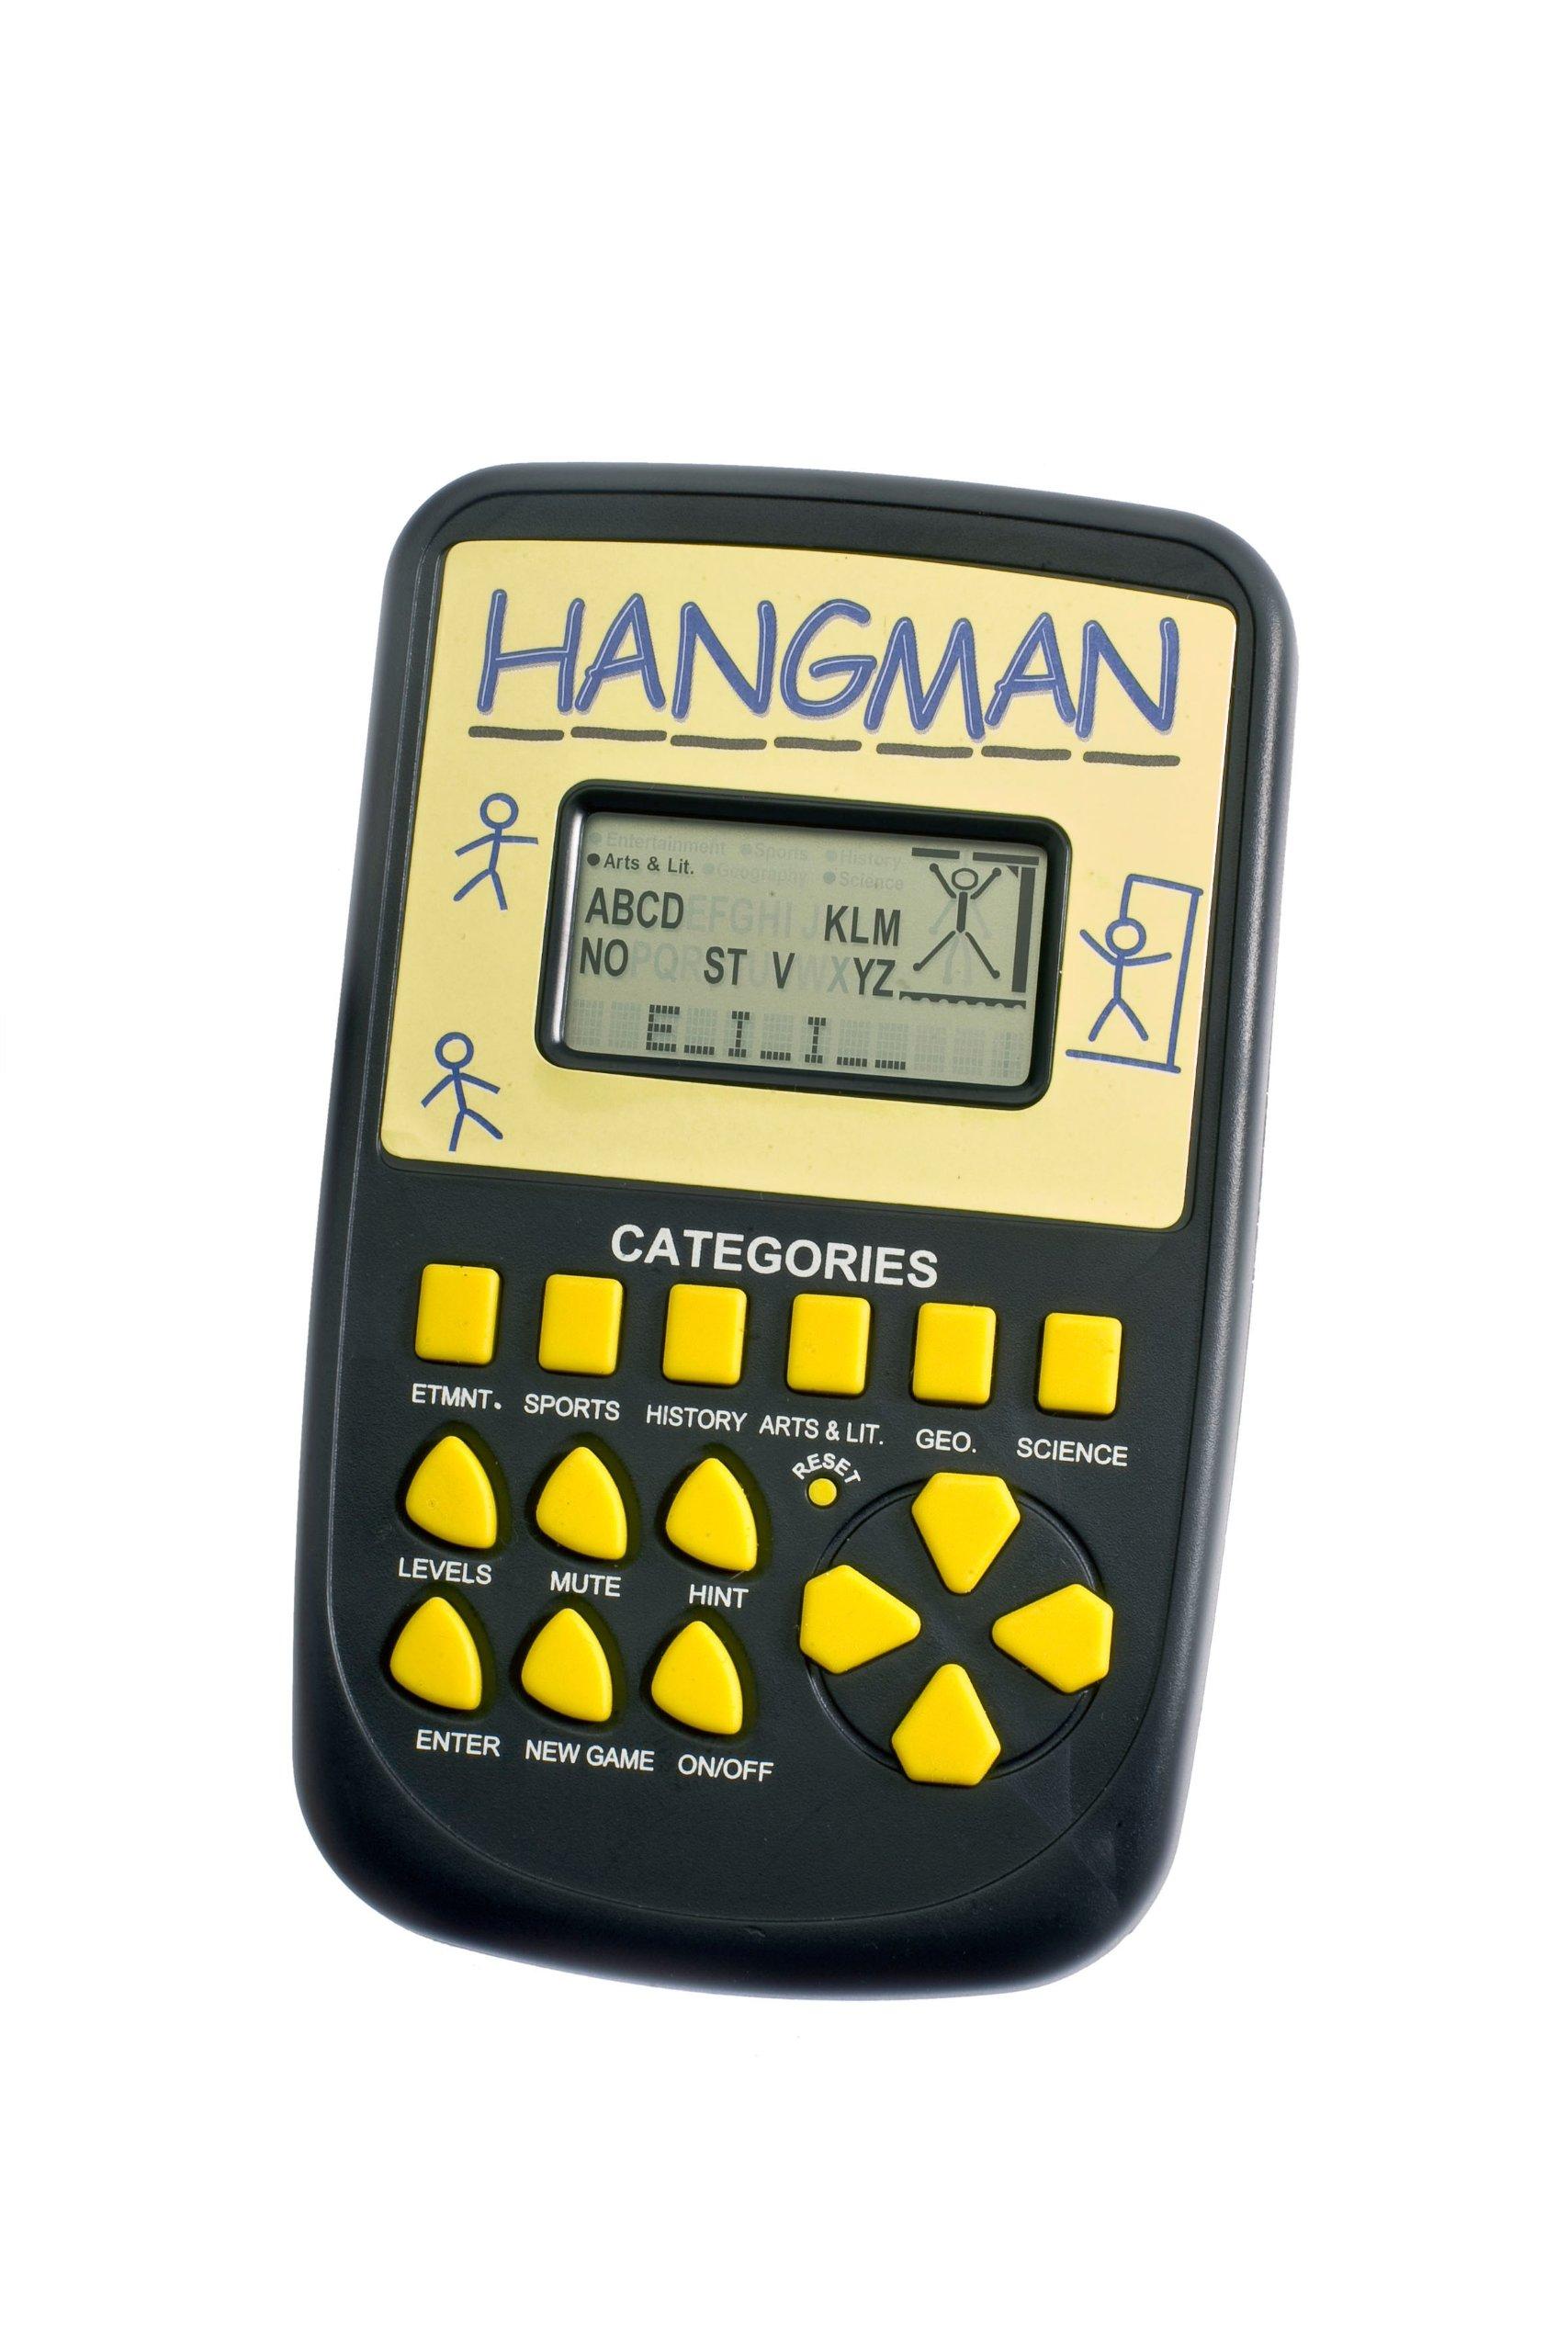 Pocket Arcade Electronic Hangman Game by Pocket Arcade